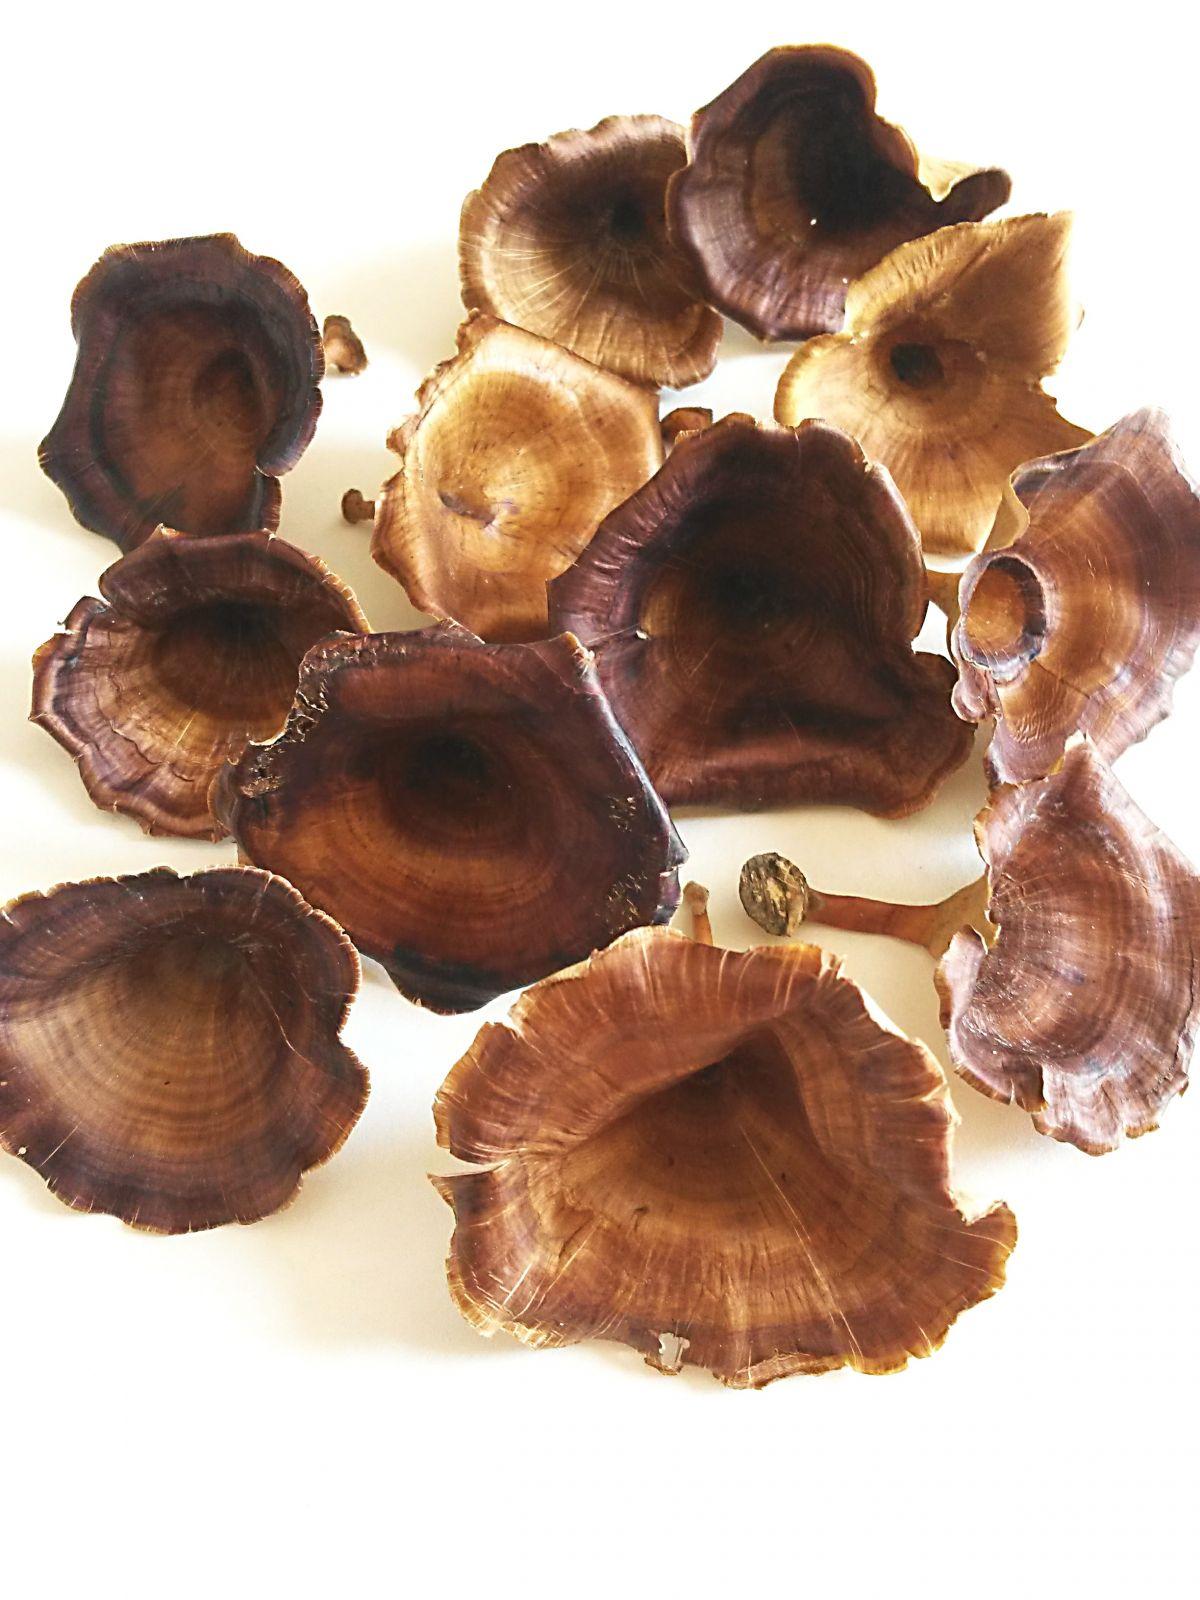 Dekorace přírodní Golden mushroom 3-5cm - 5 ks